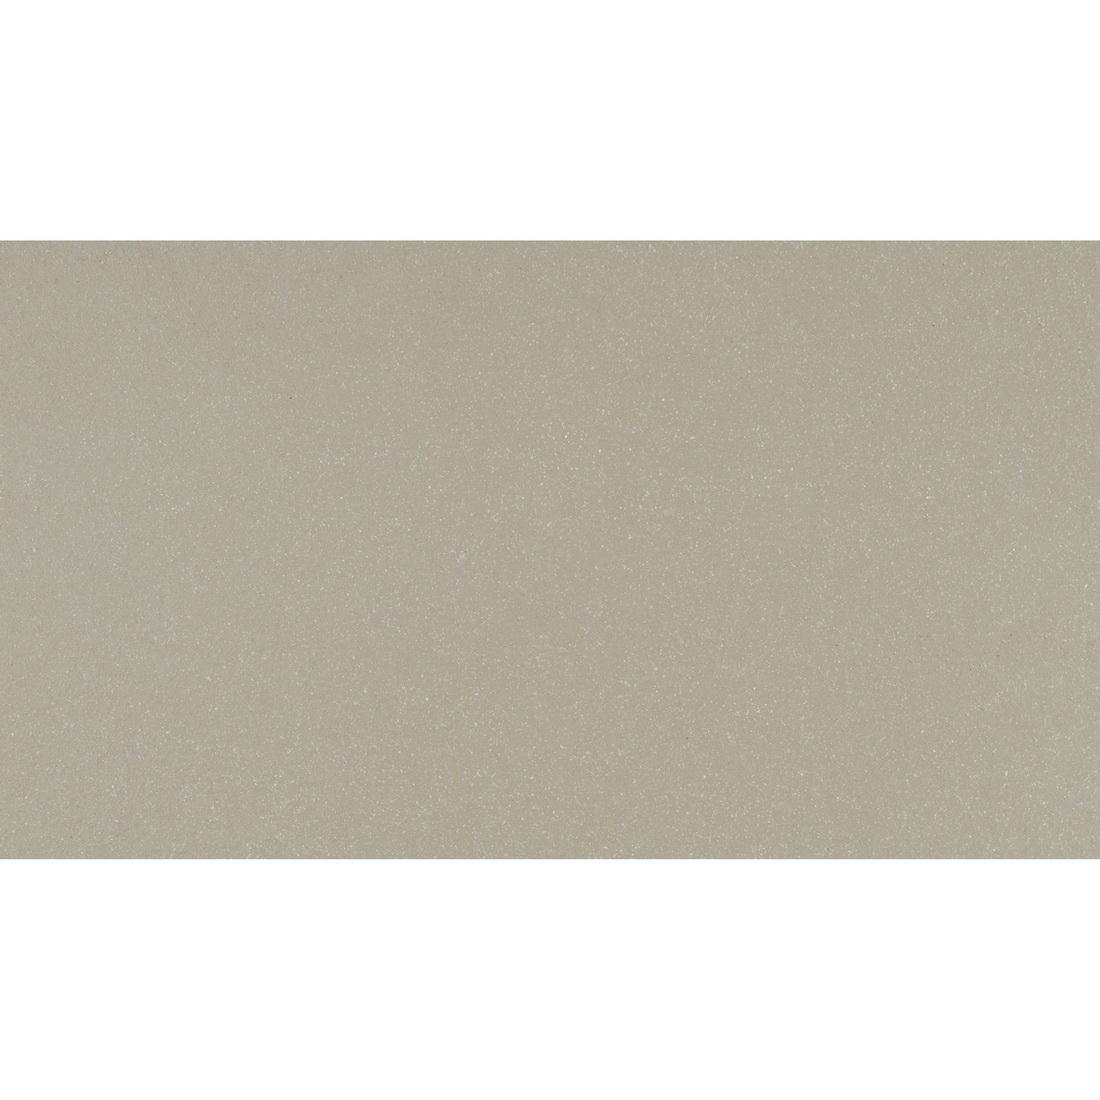 Territory Savanna 16x455x3030mm Panel Haze 2 Sheet